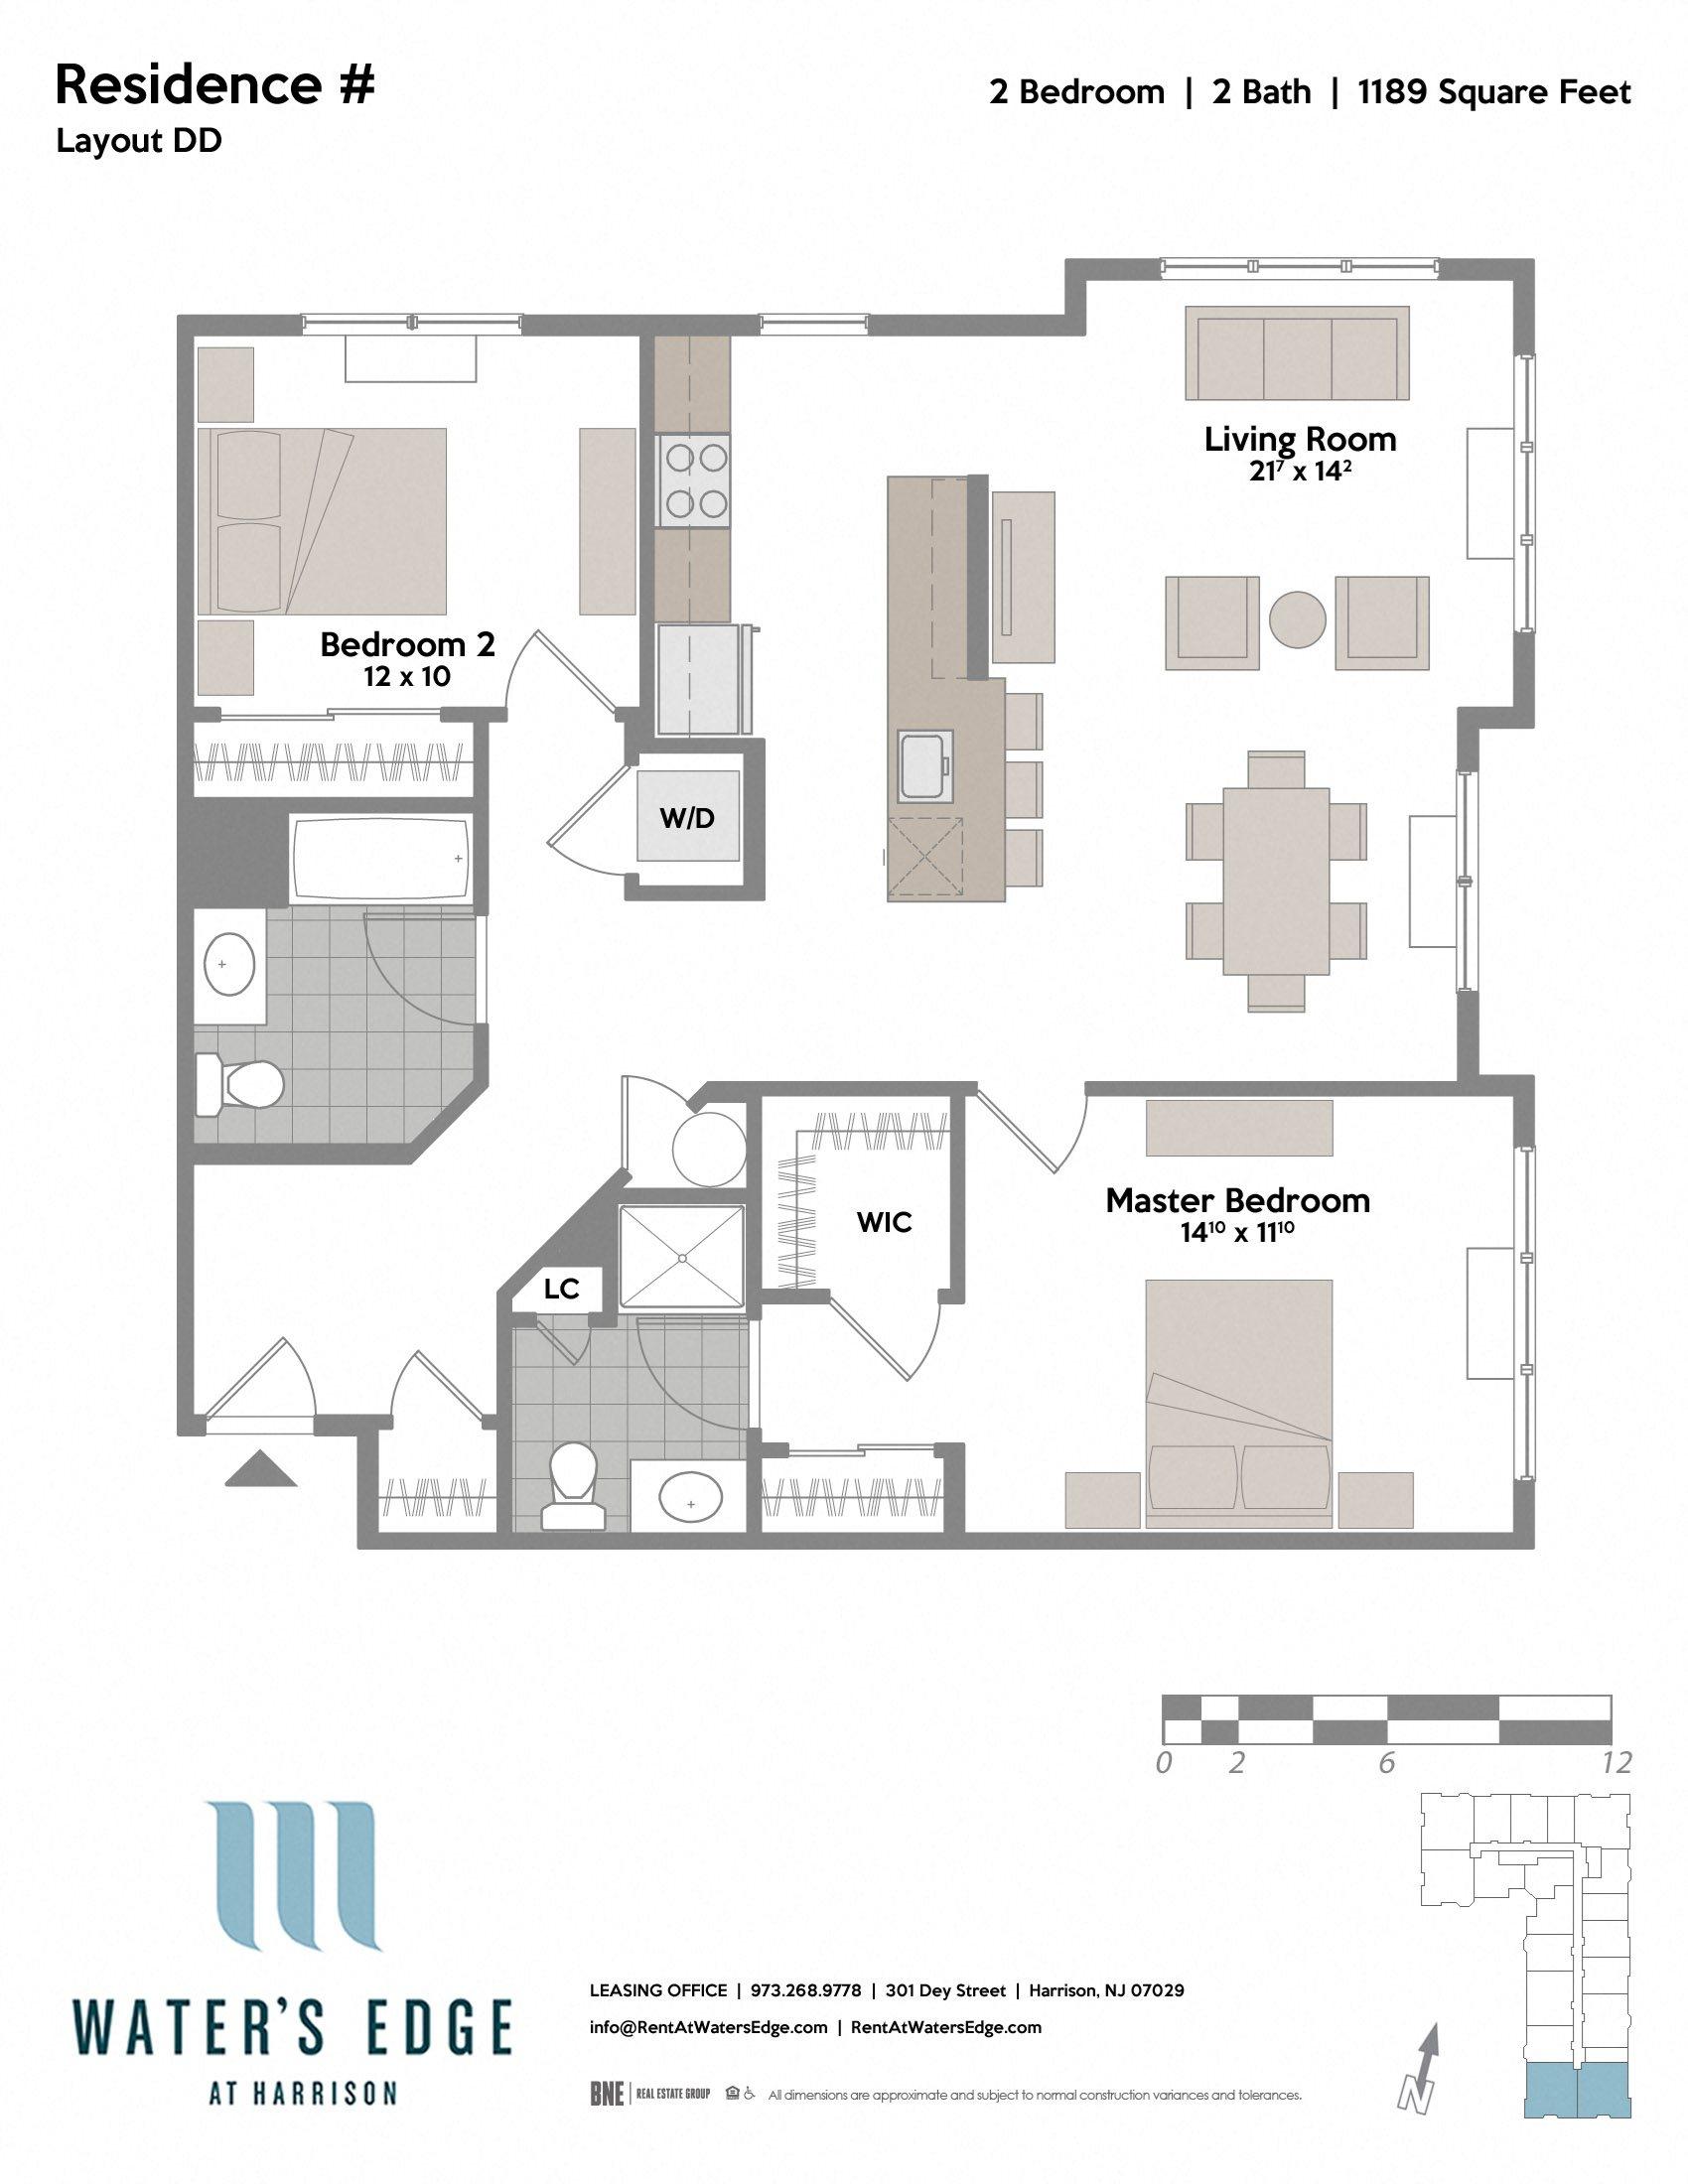 Layout DD Floor Plan 6